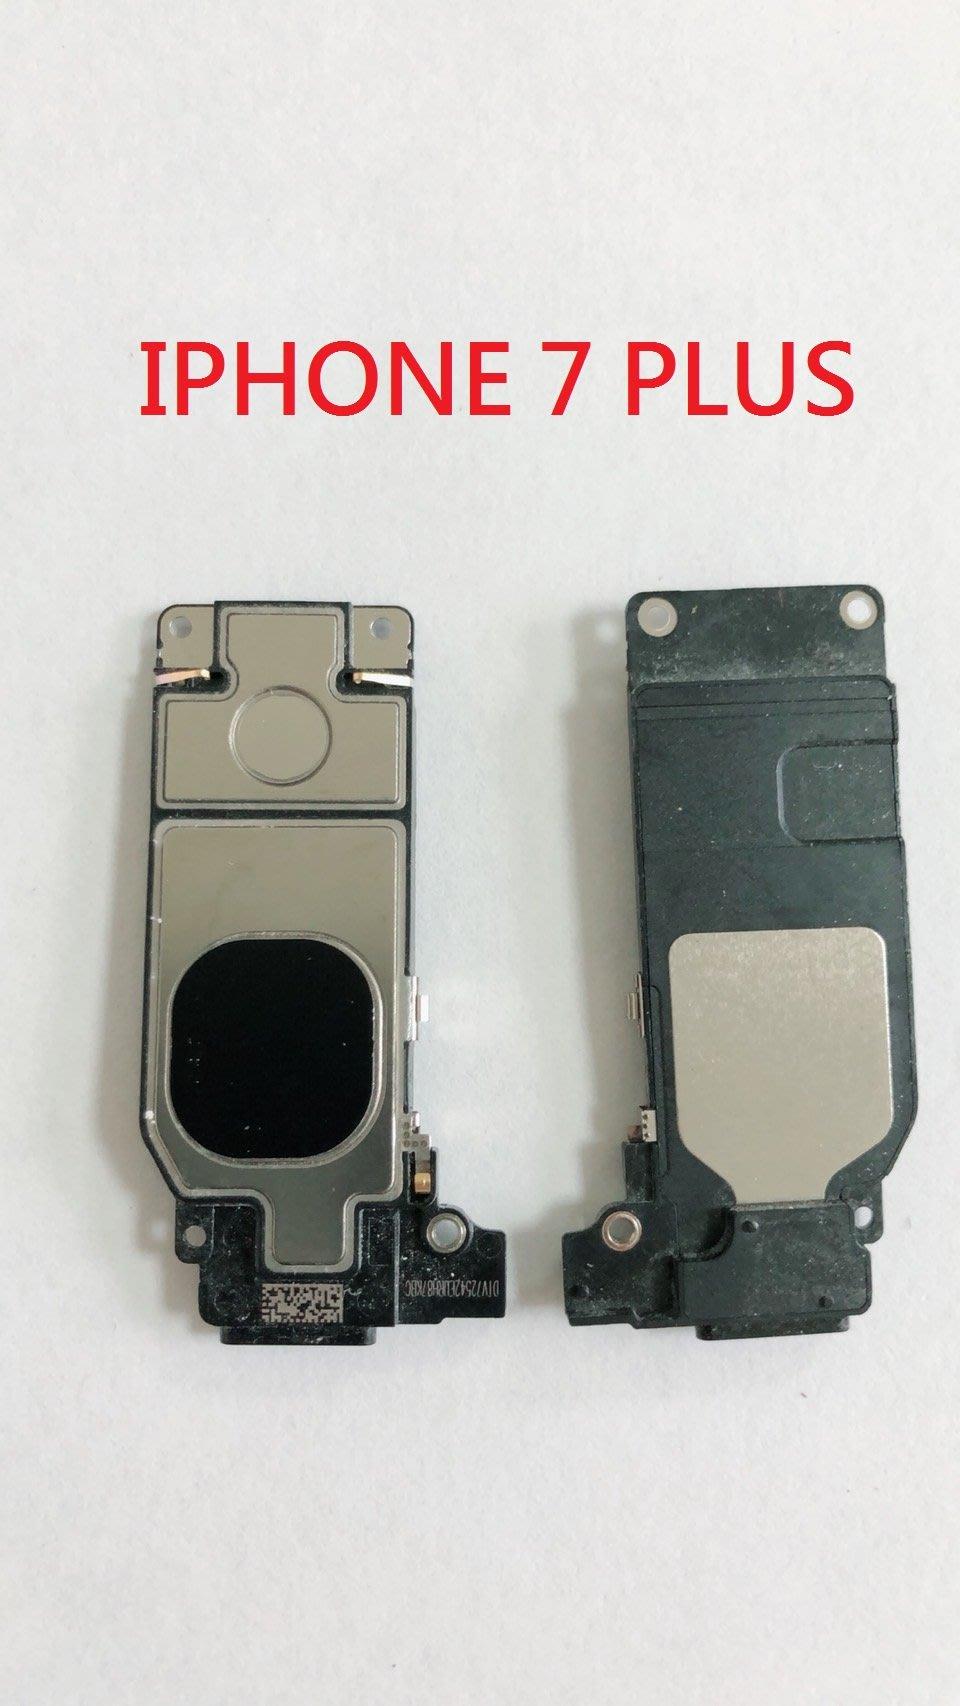 全新現貨 iPhone 7 plus i7+ i7P 喇叭 揚聲器 破音 無聲音 iPhone7+